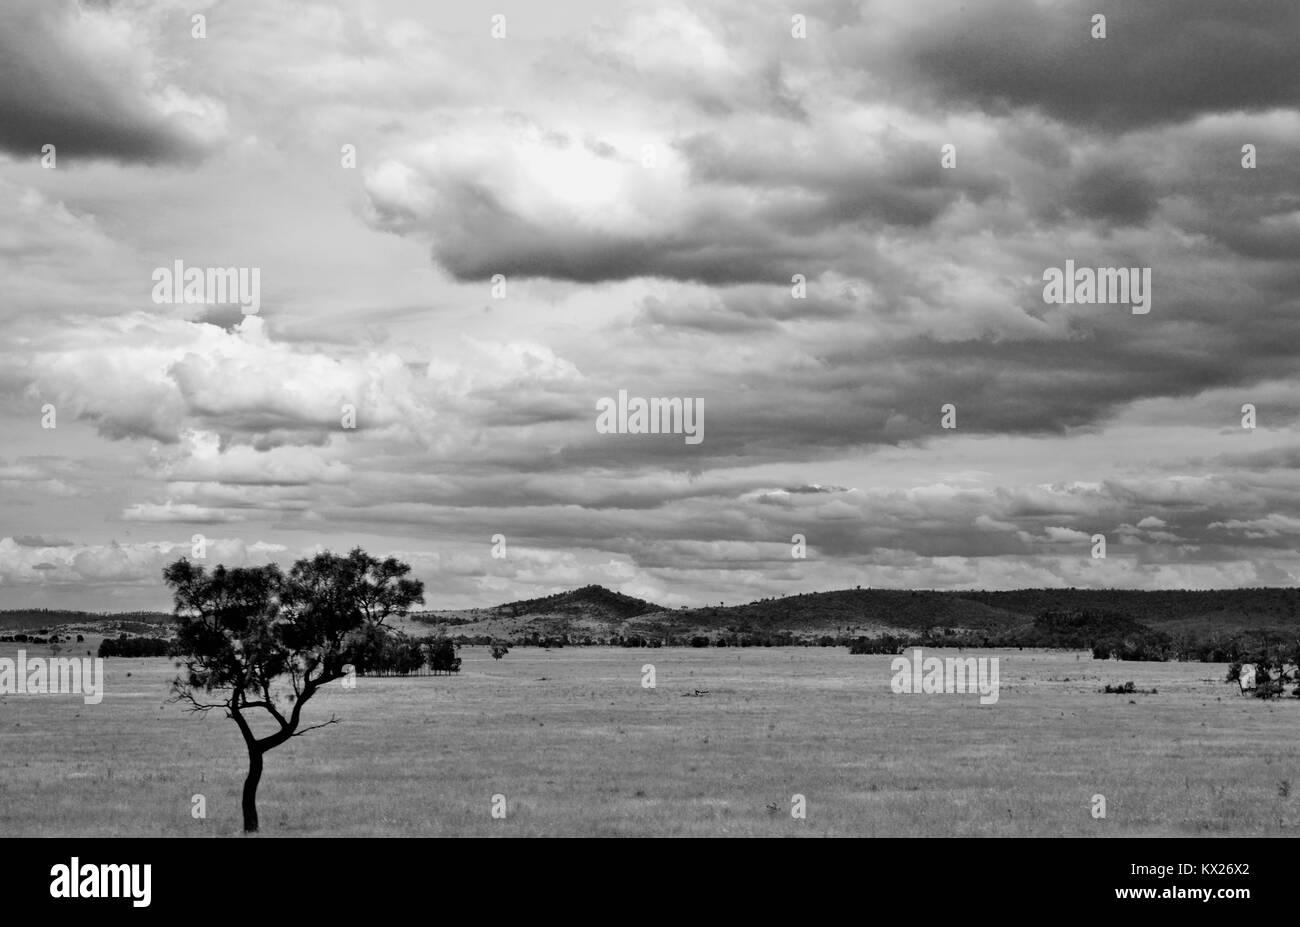 Dramatic black and white images of Australia, december, Queensland, Australia - Stock Image